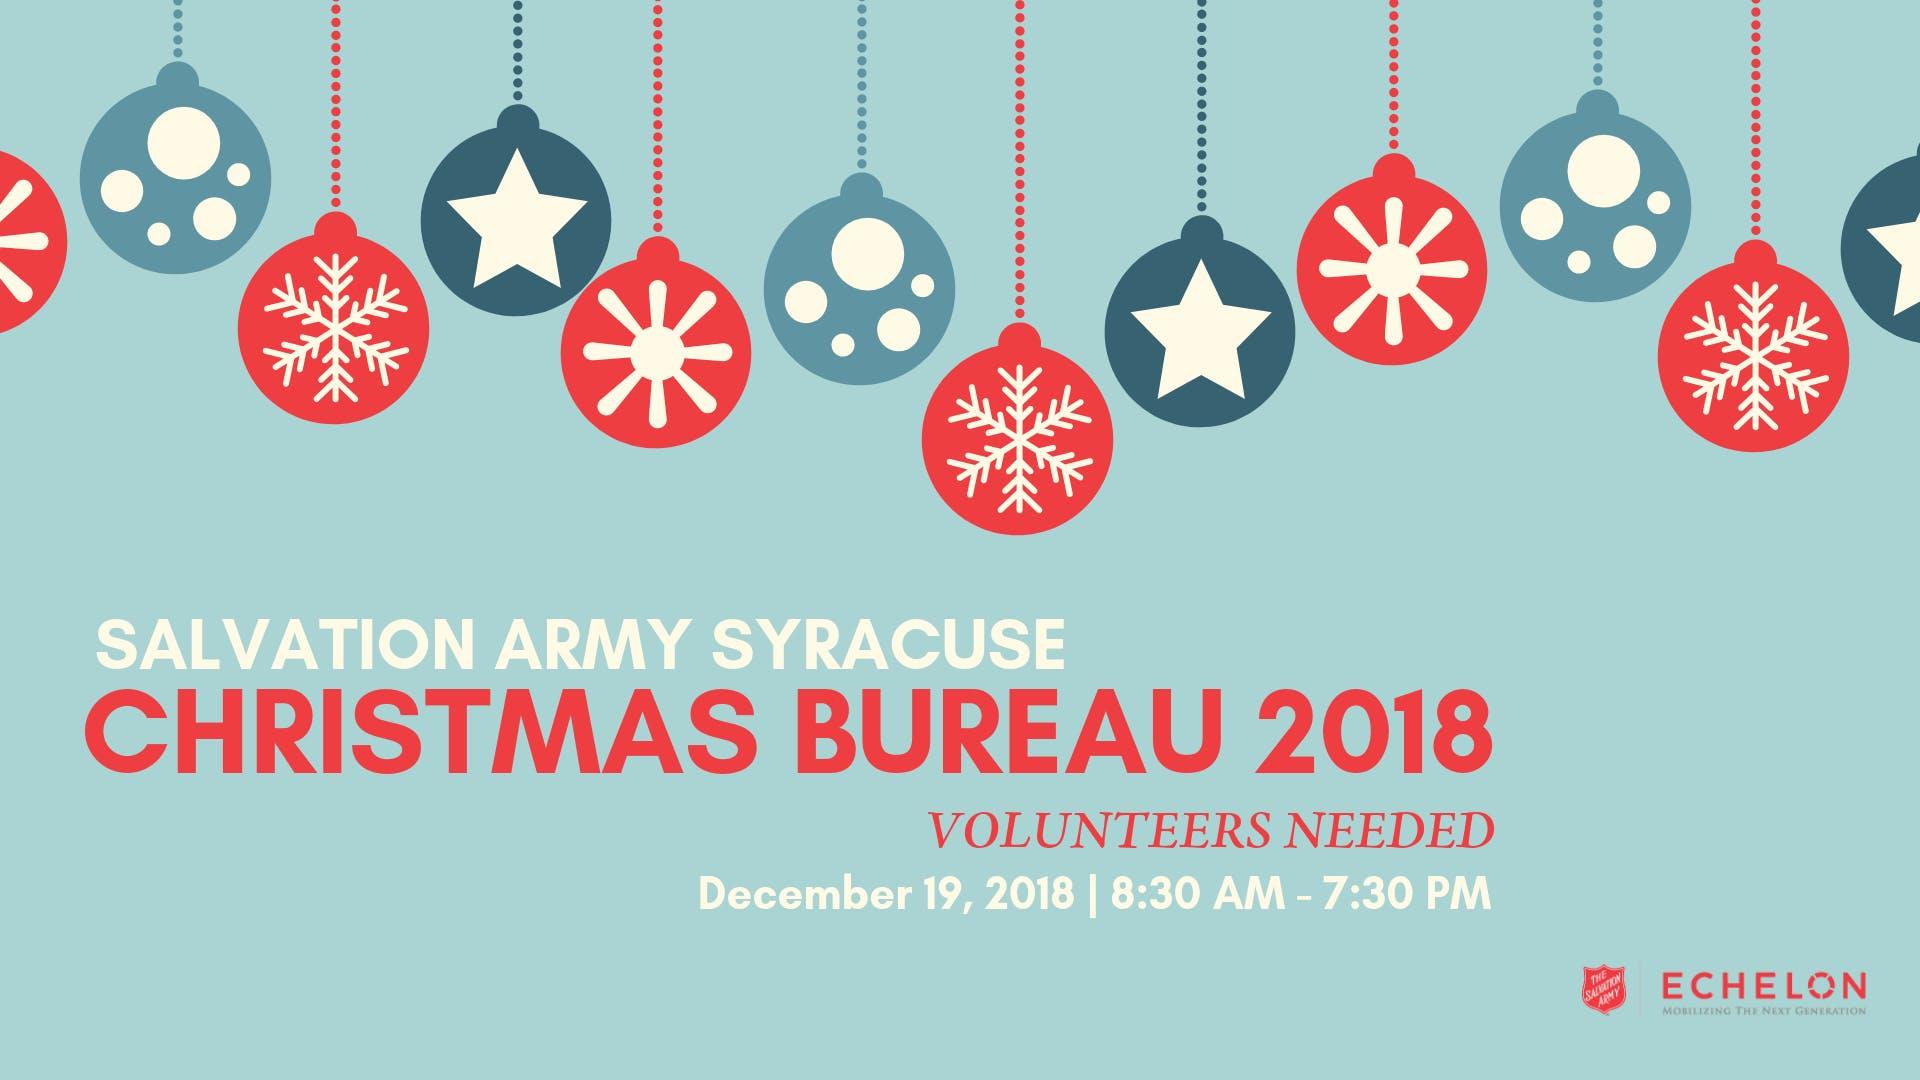 Salvation Army Christmas Bureau Distribution